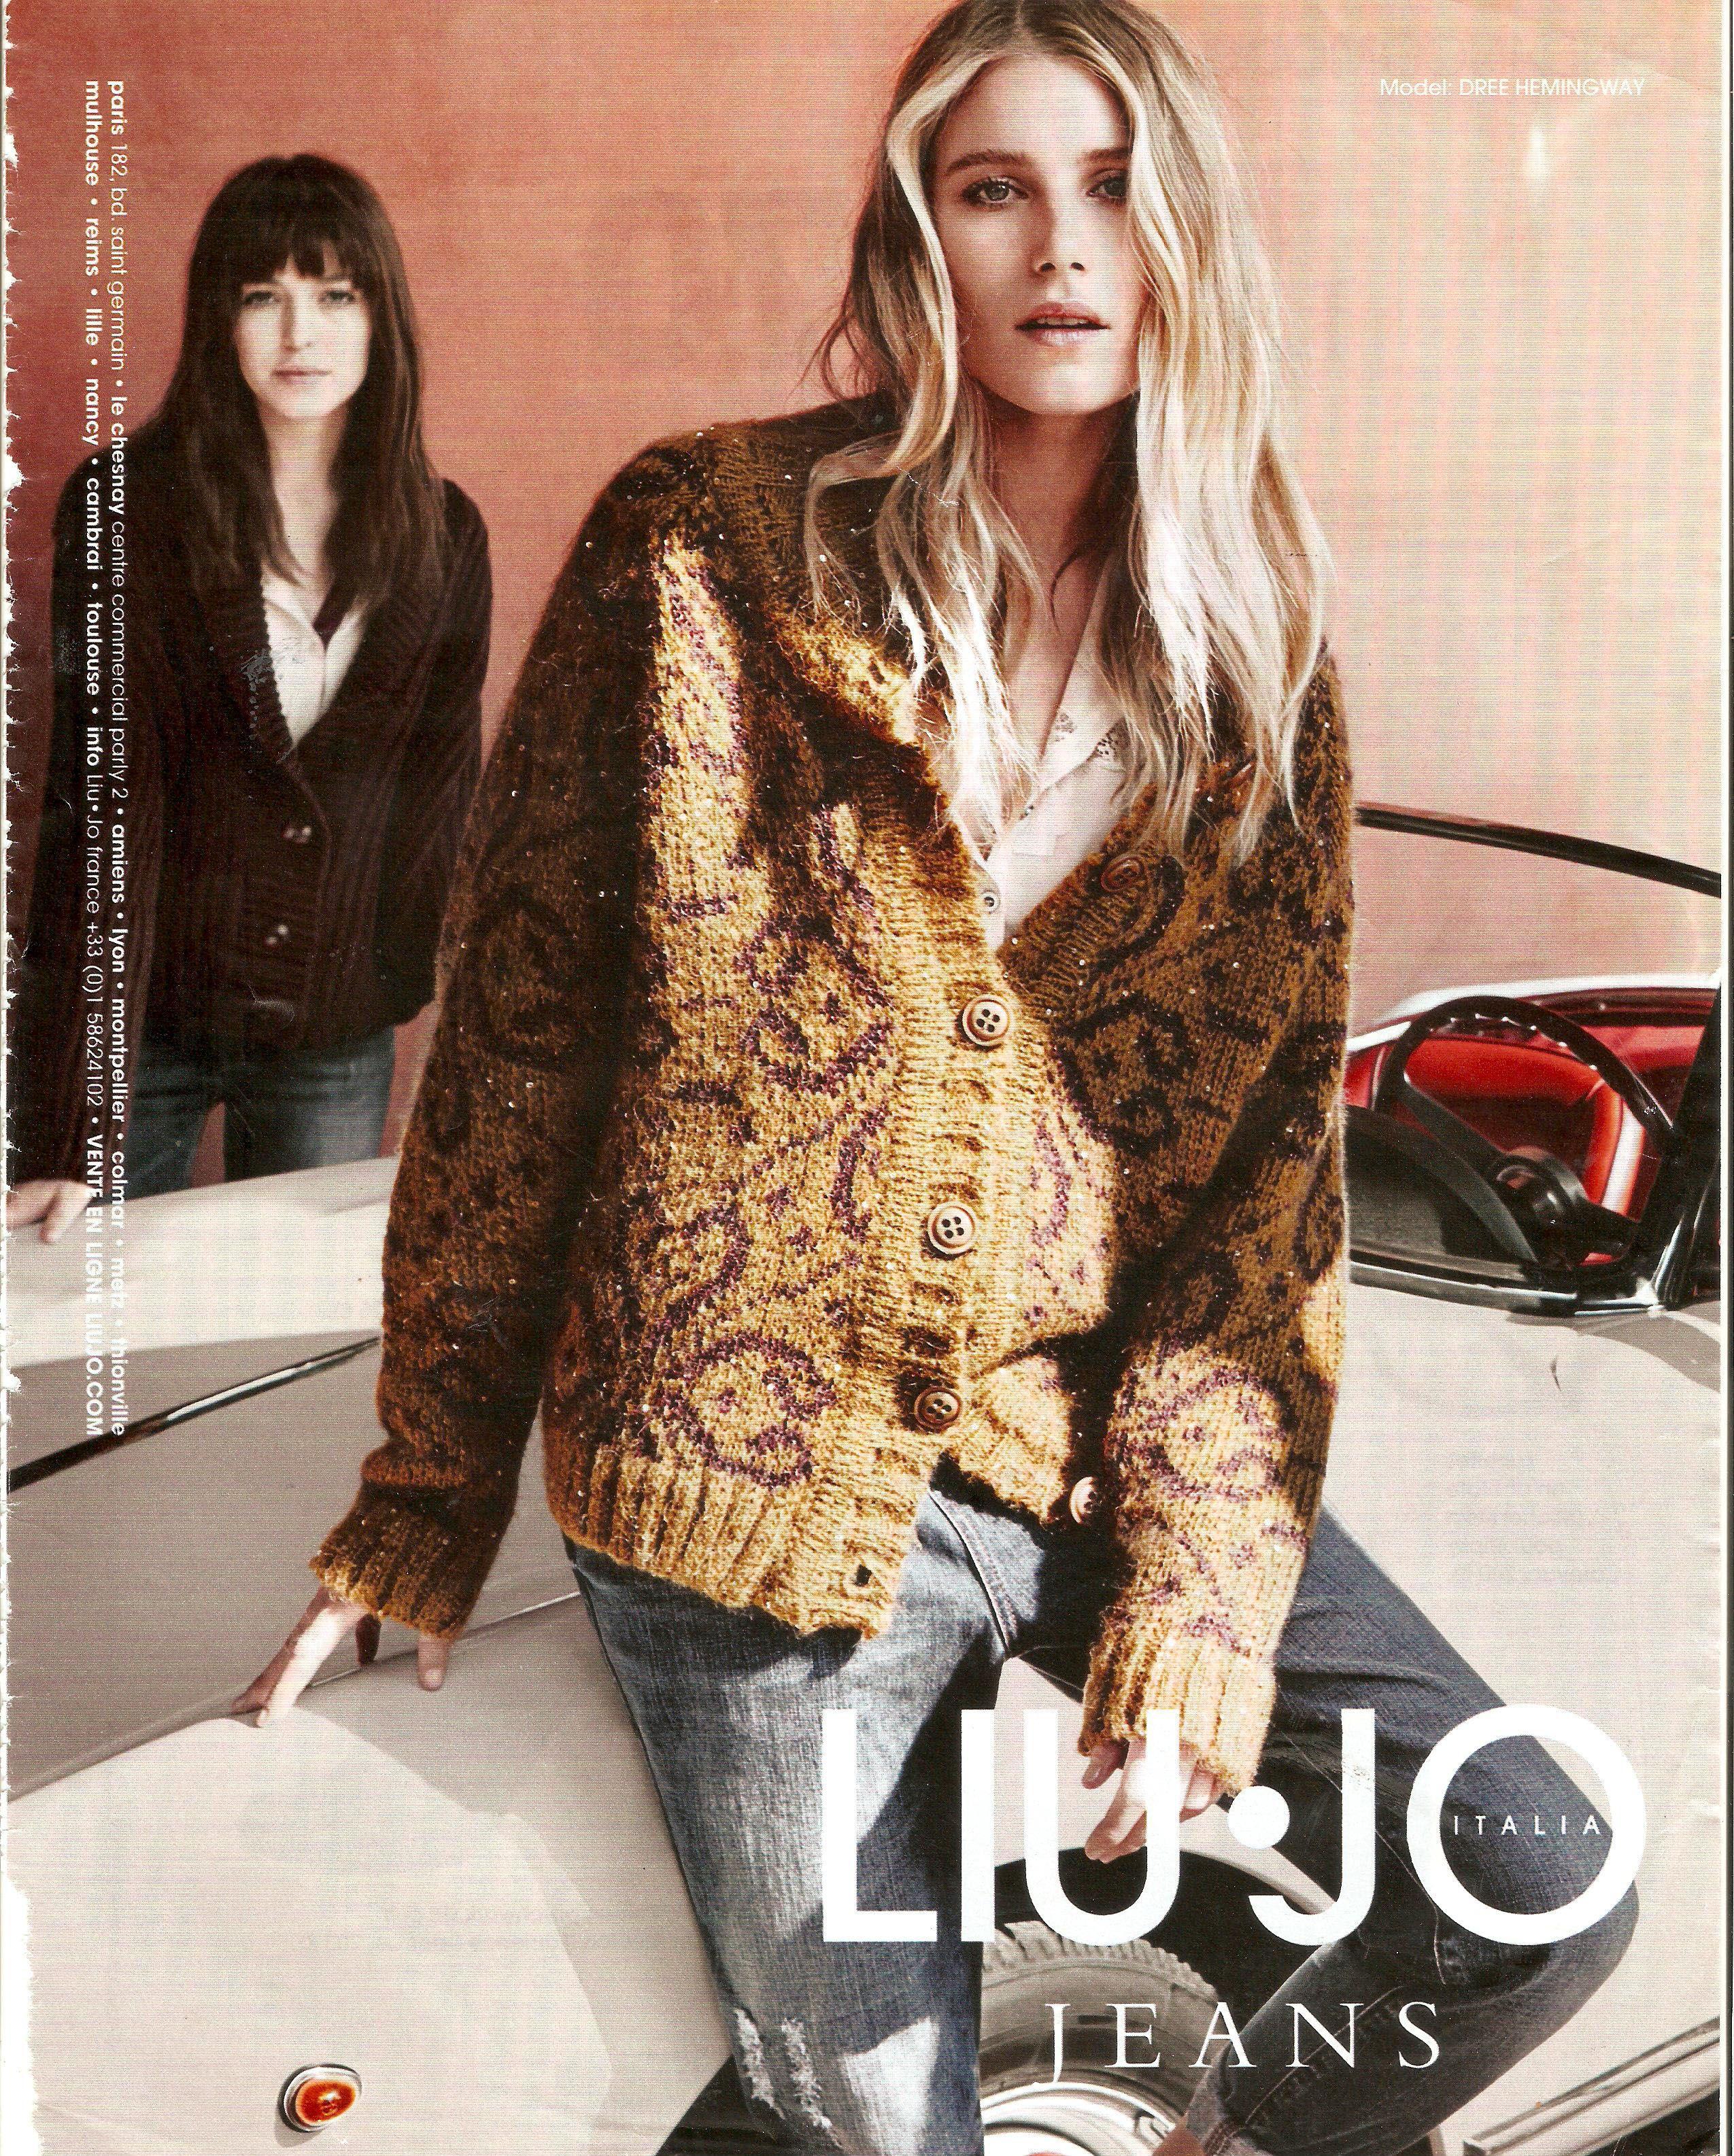 new product be028 dcf58 Liu Jo Italia Jeans Advert | DENIM | Jeans, Denim, Blazer